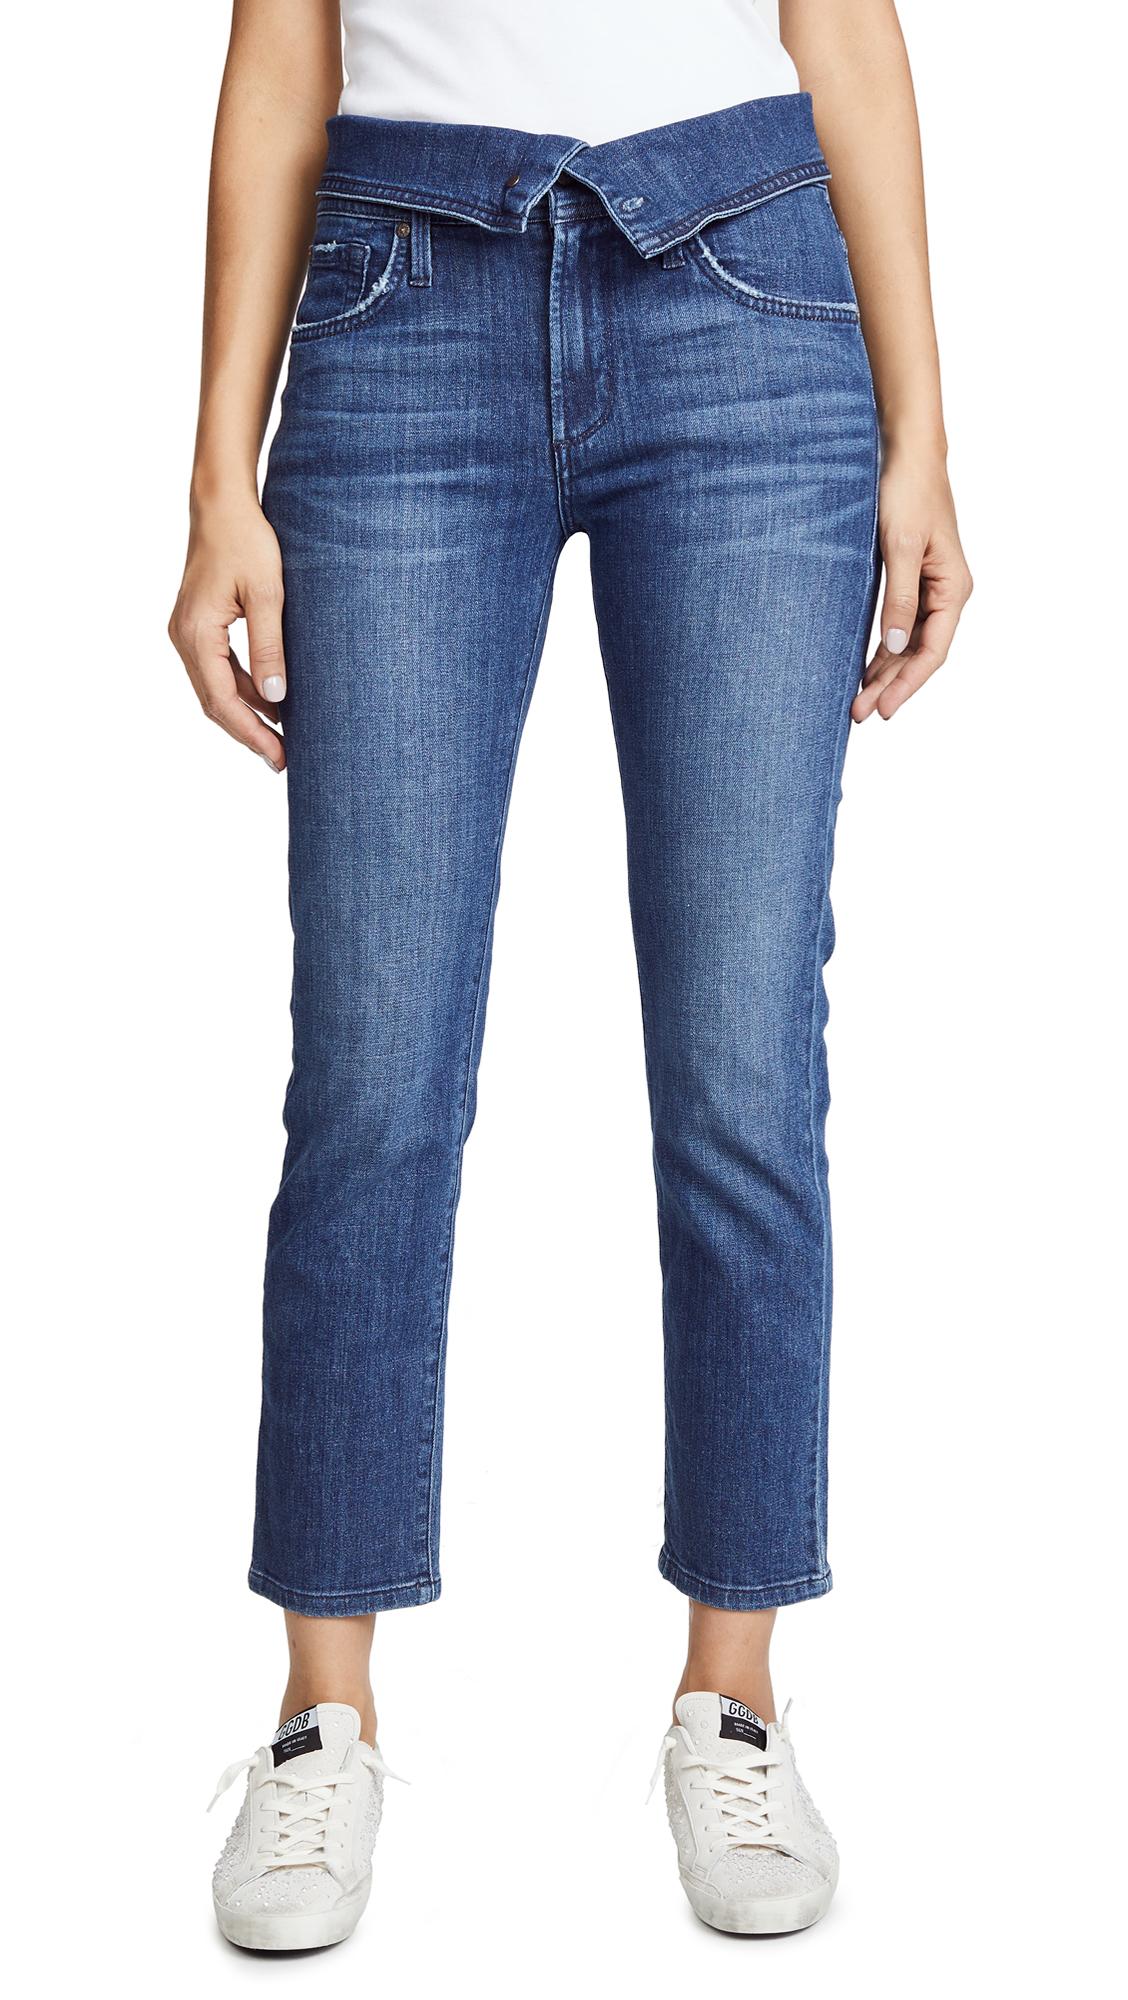 JAMES JEANS Folie Fold Over Jeans in Retrospect